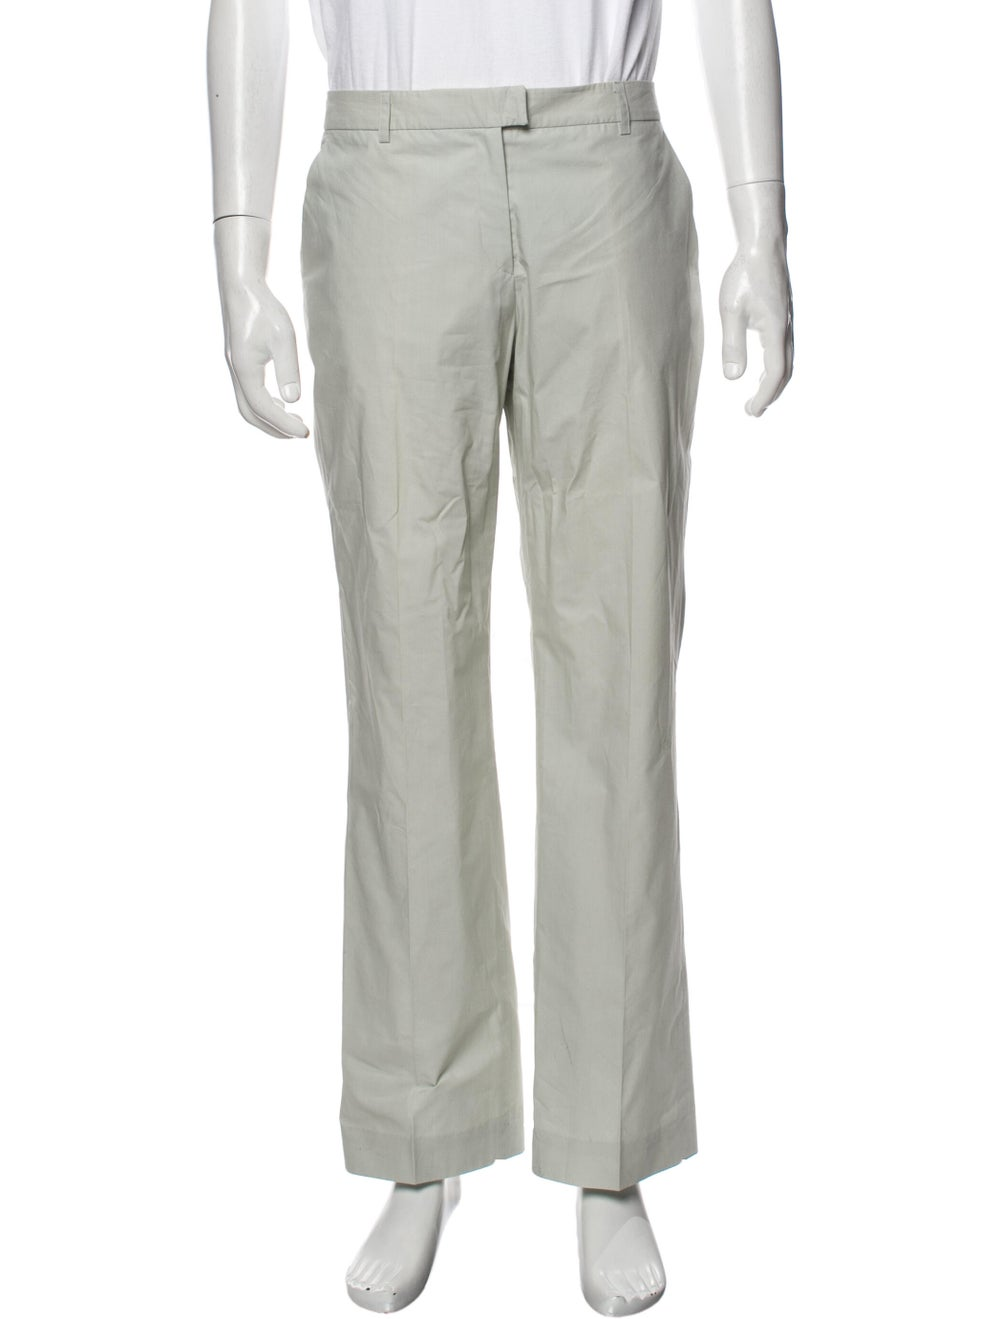 Asprey Pants Green - image 1